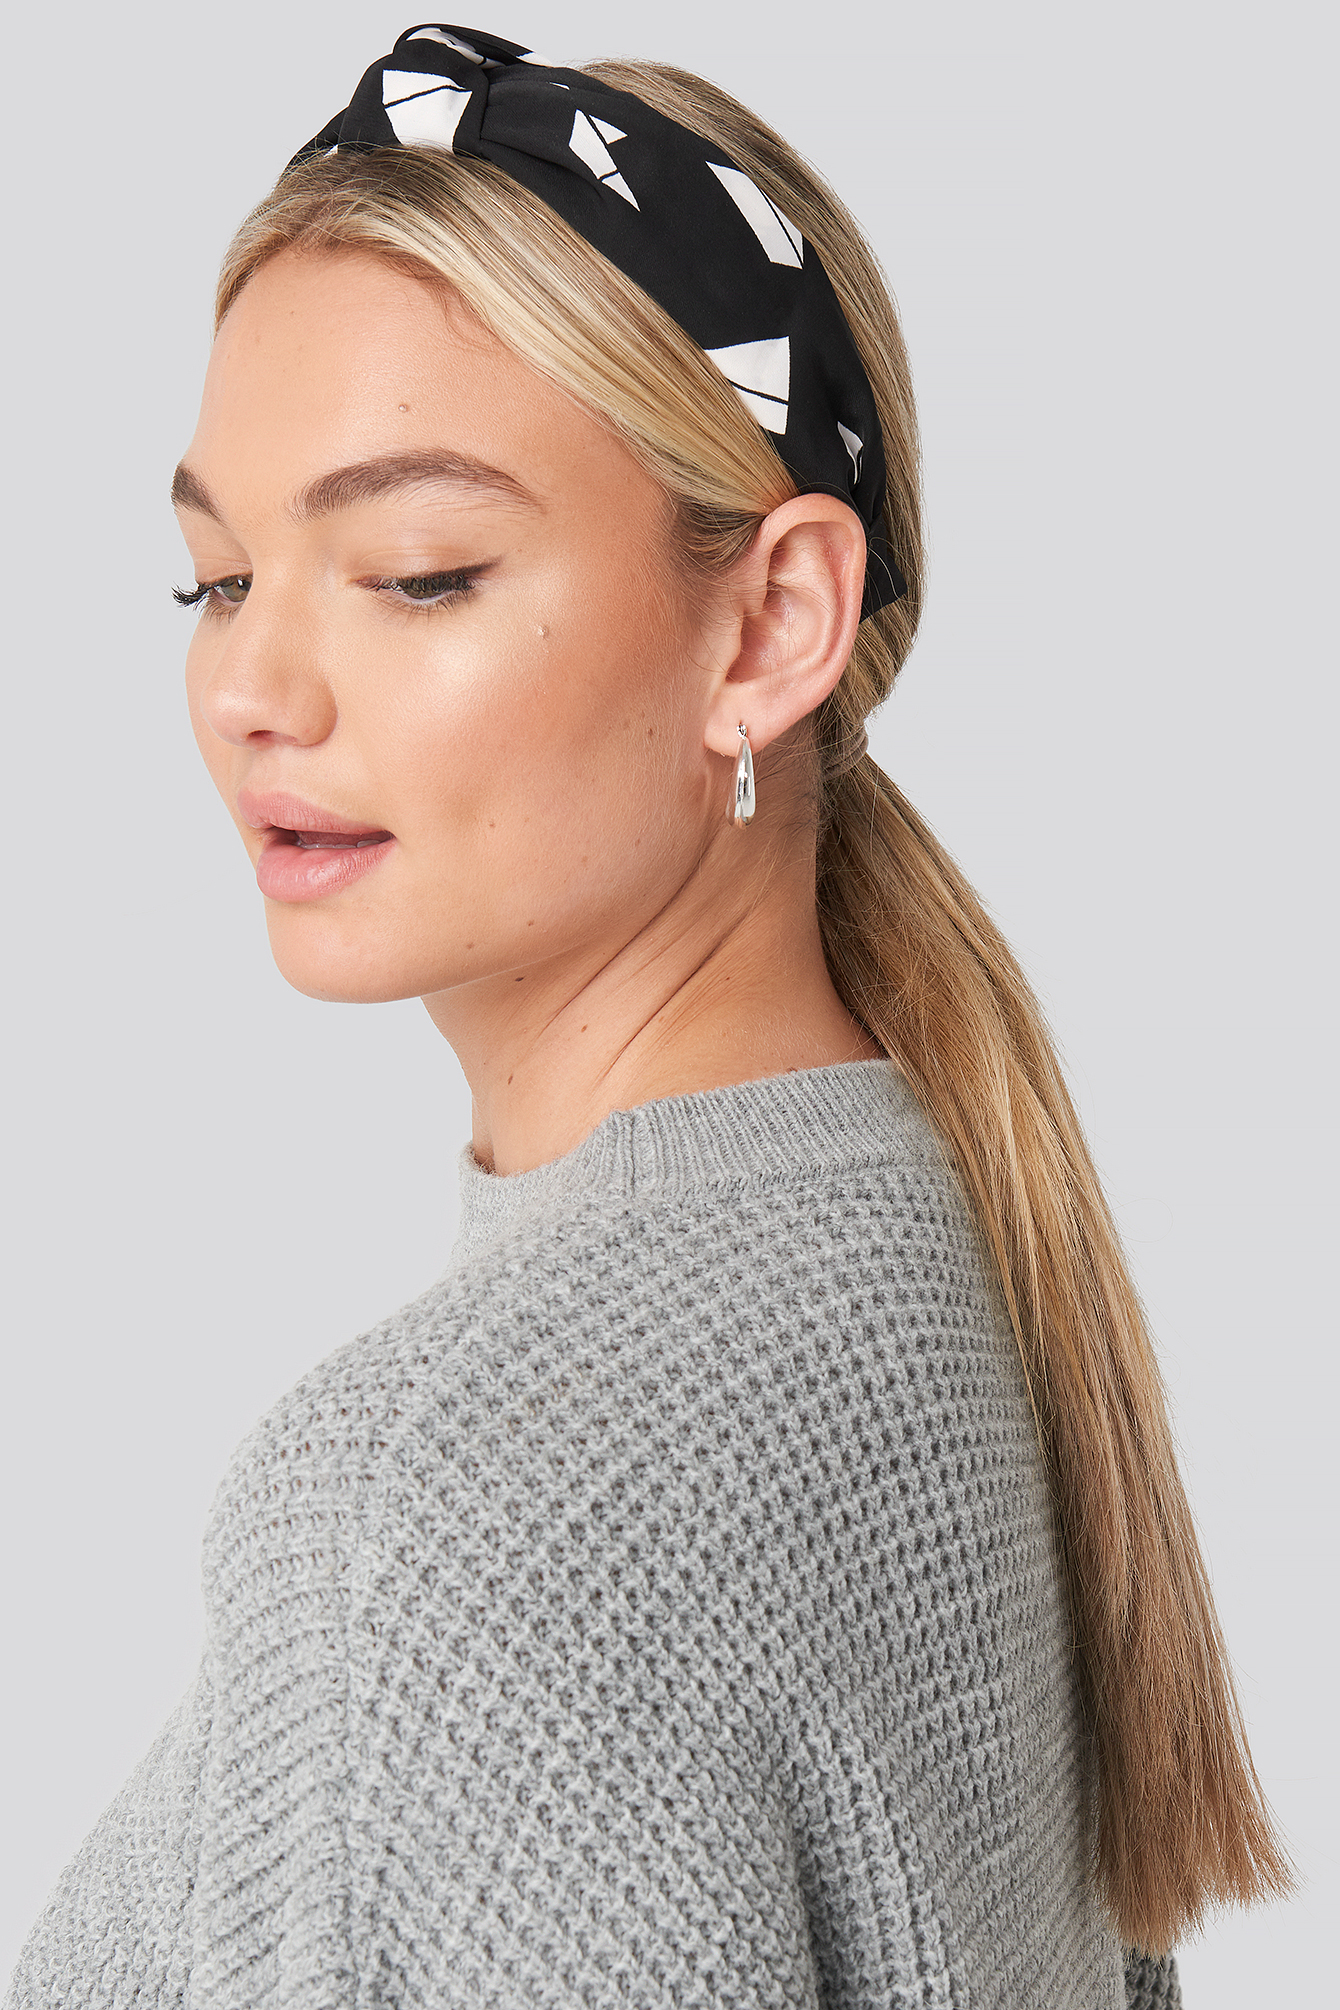 na-kd accessories -  Graphic Print Hair Circlet (029) - Black